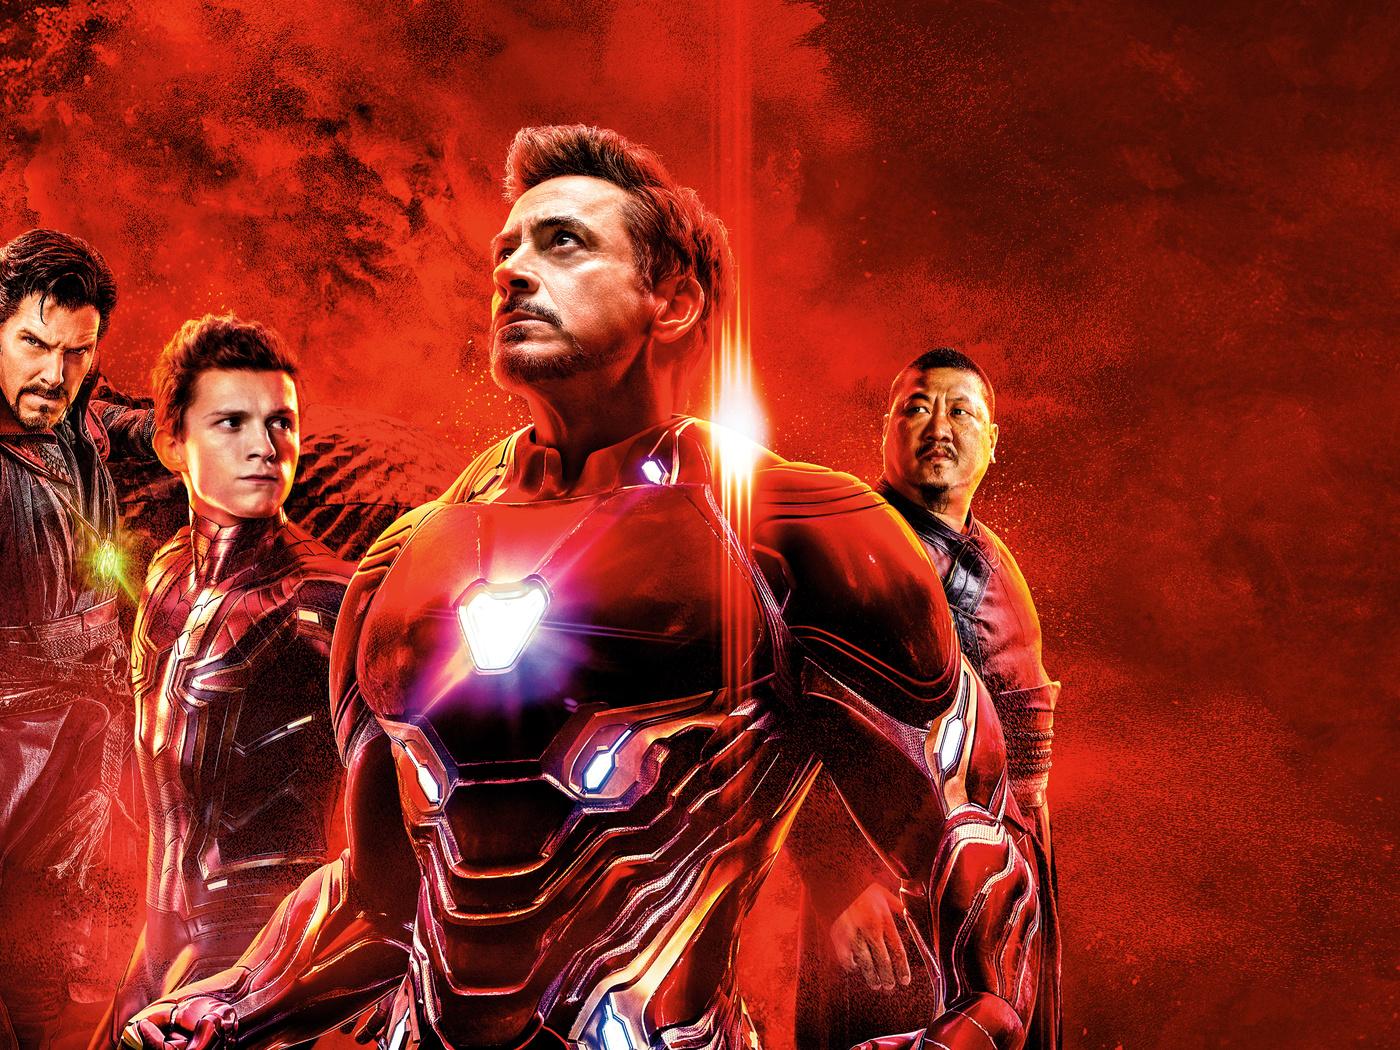 avengers-infinity-war-reality-stone-poster-8k-dh.jpg